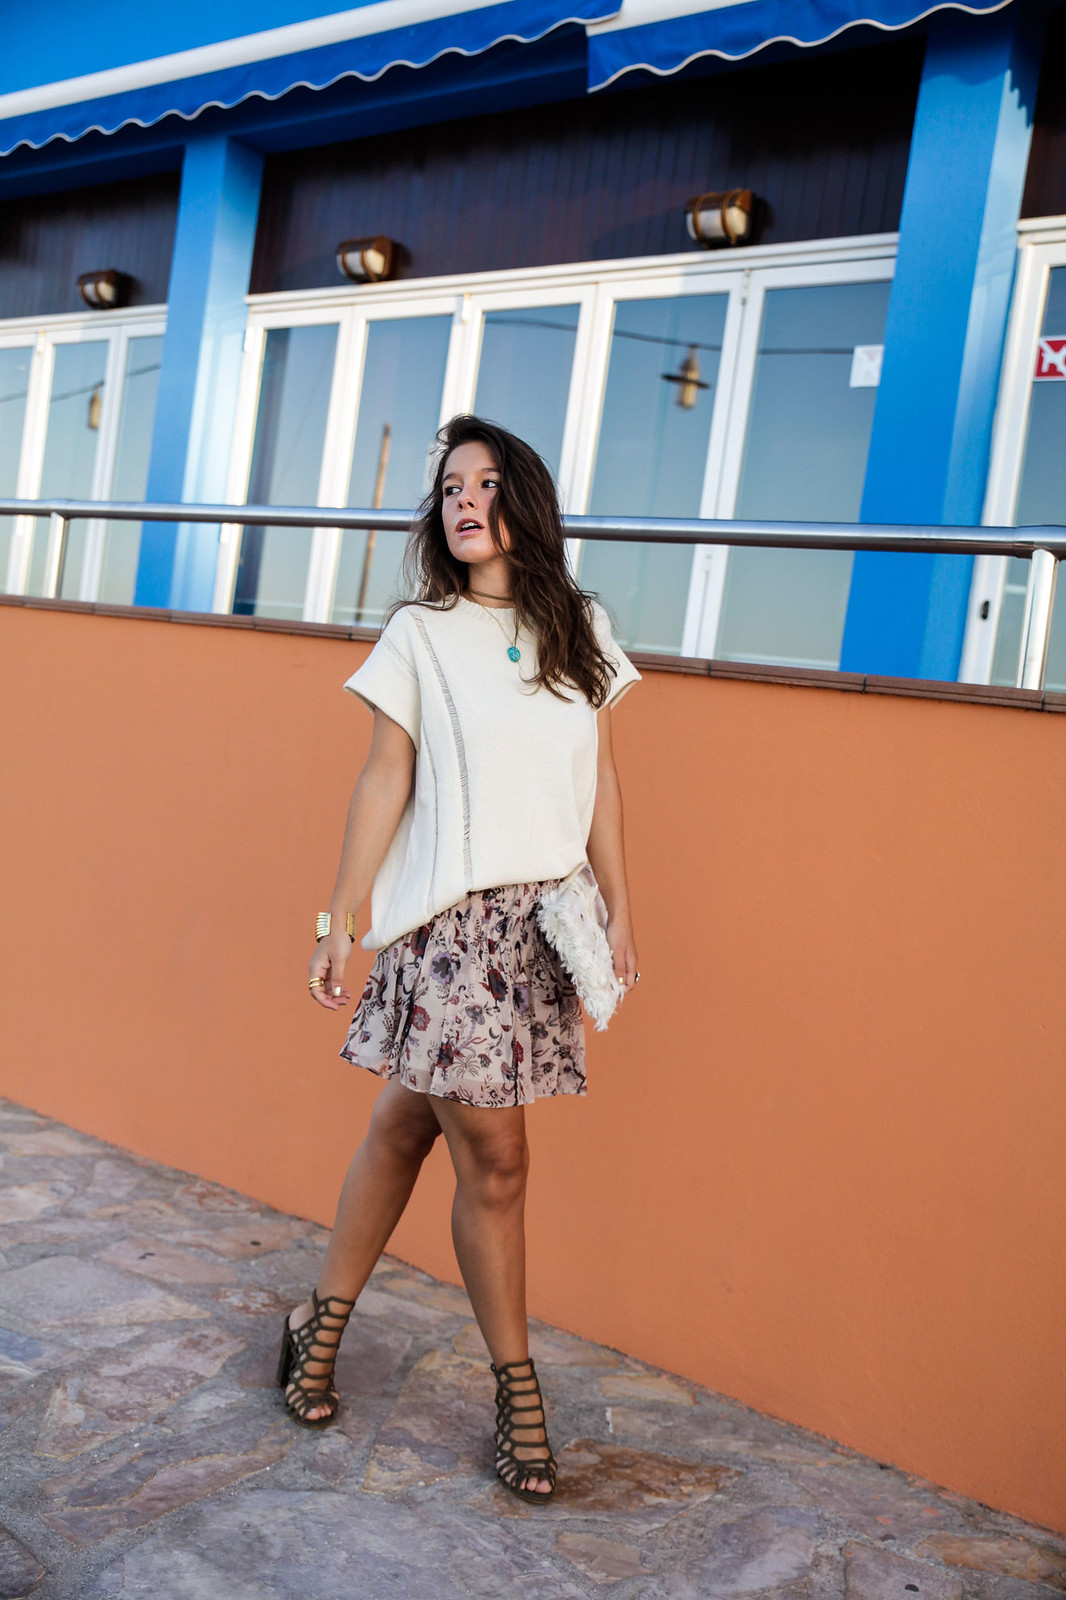 011_blusa_punto_falda_flores_summer_outfit_theguestgirl_rüga_schade_jewels_steve_madden_.magali_pasacal_influencer_barcelona_blogger